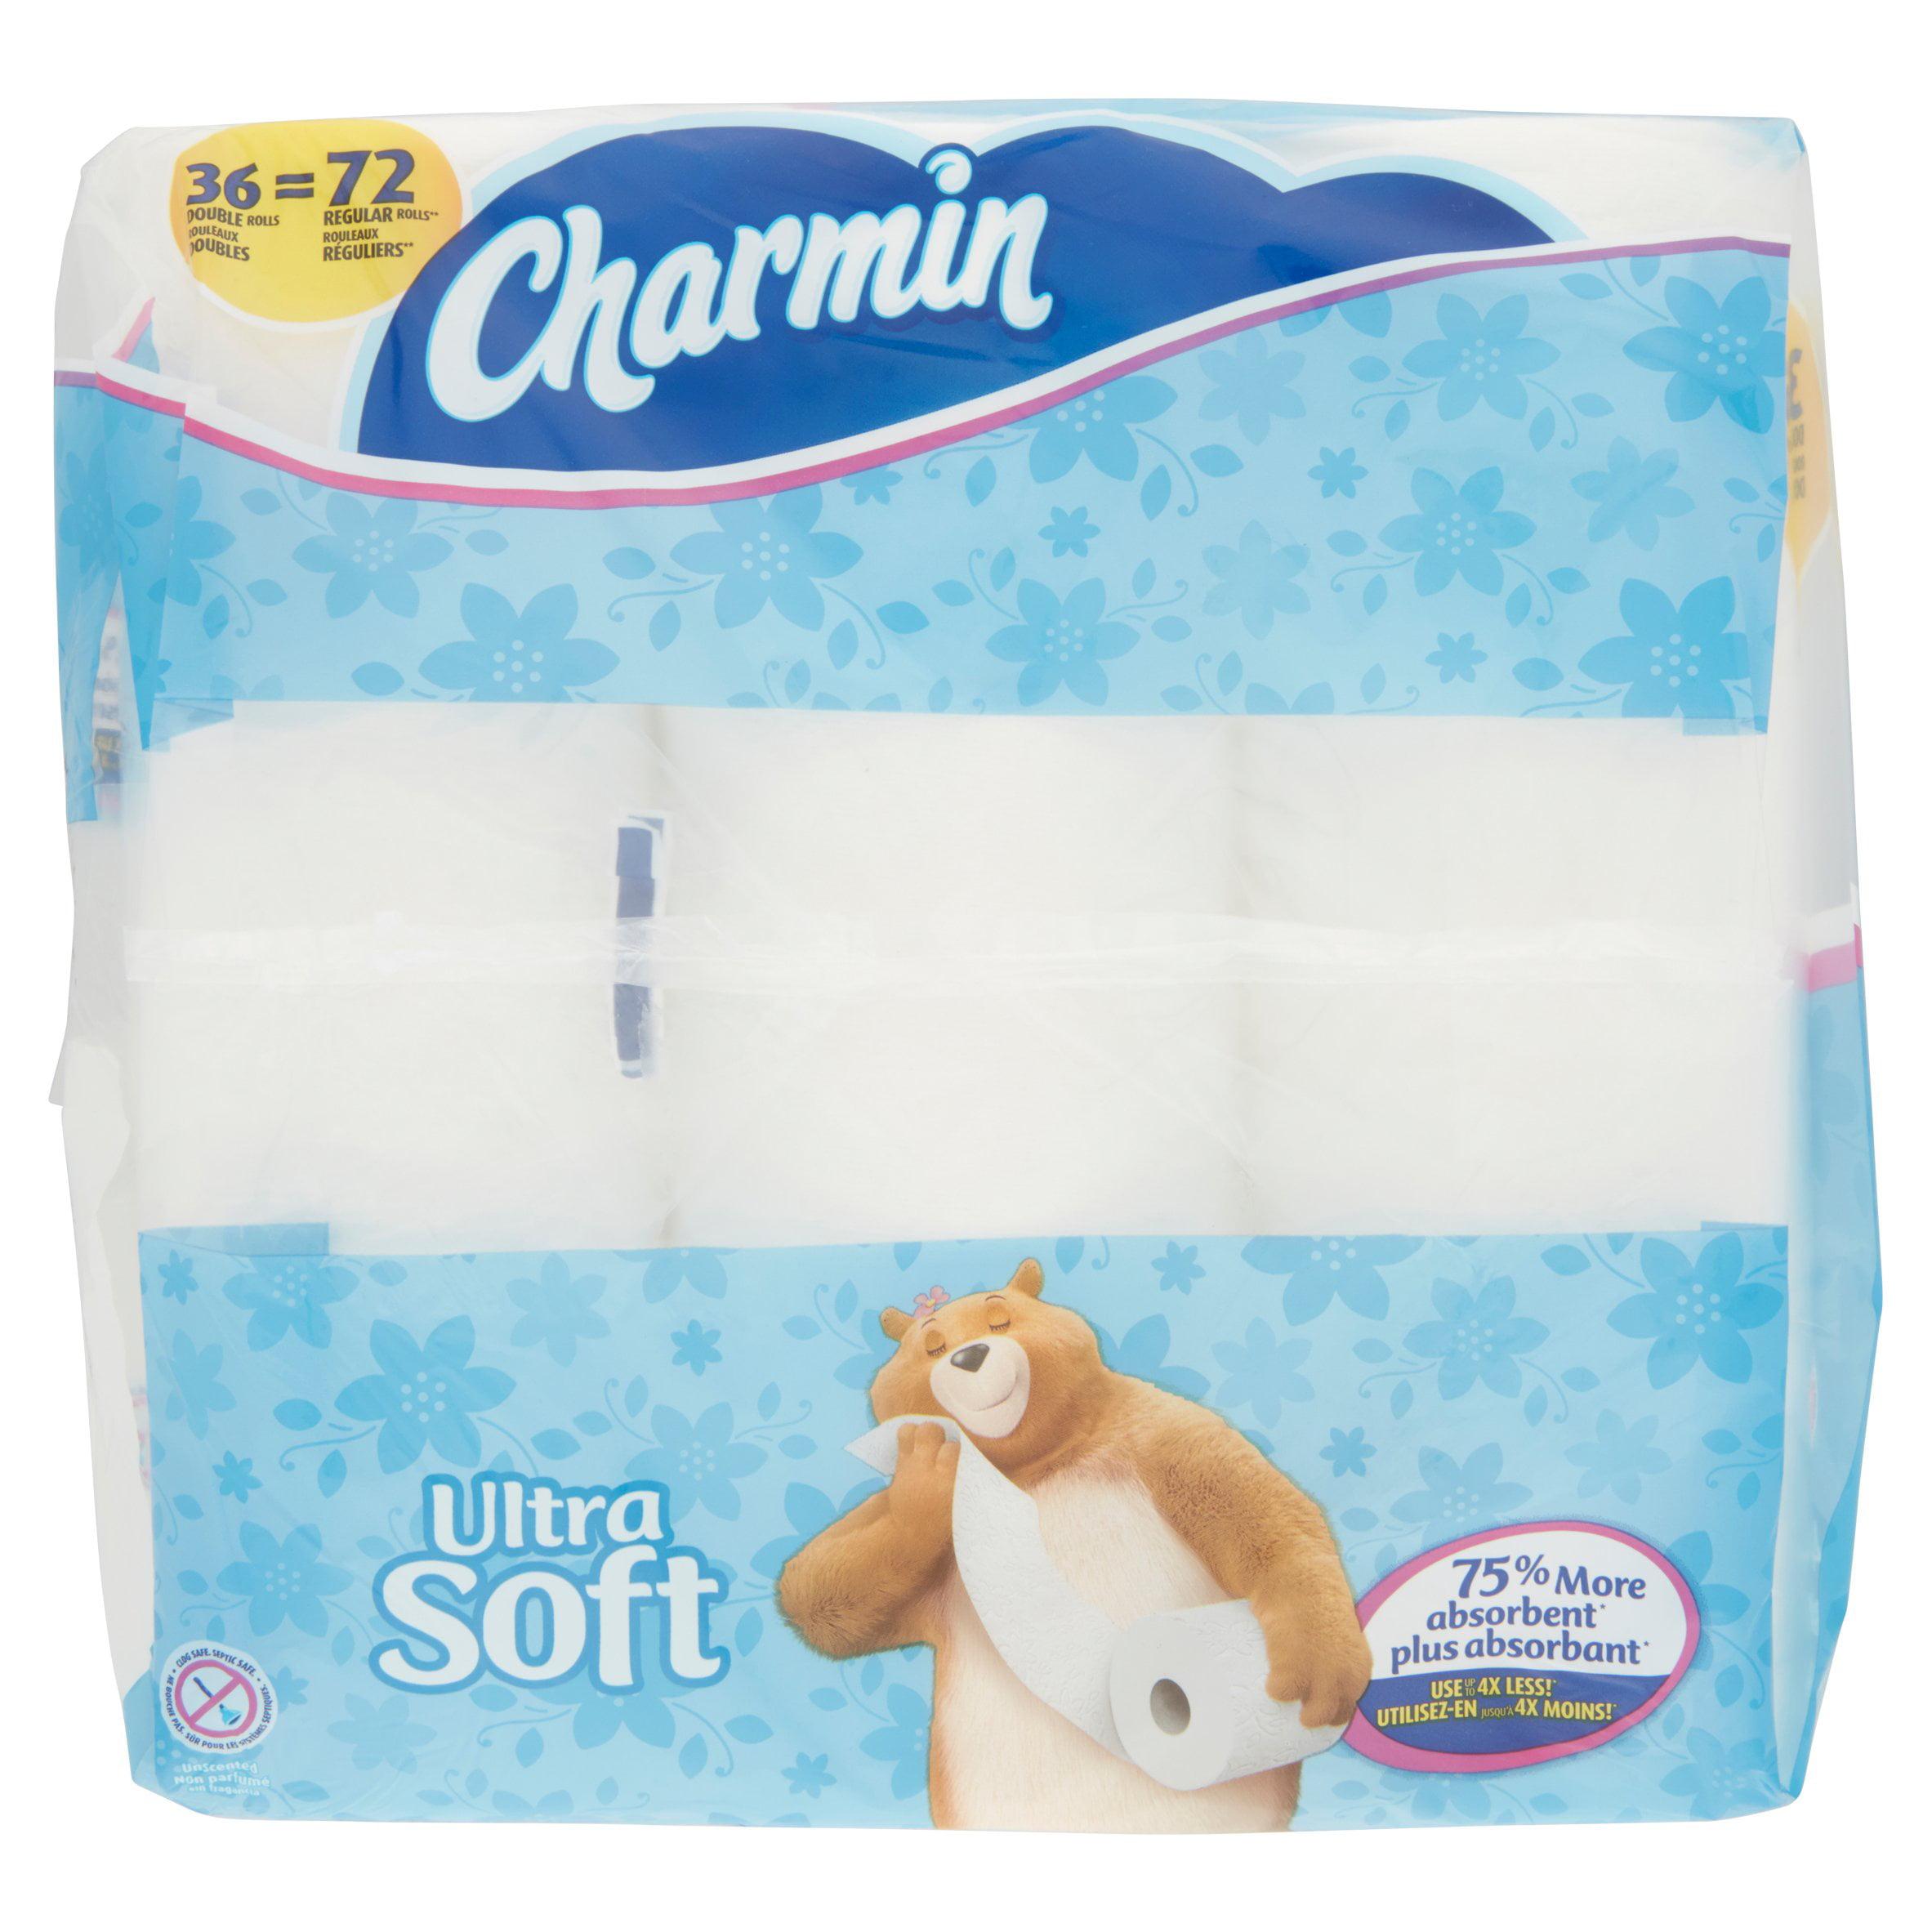 Charmin Ultra Soft Toilet Paper 36 Double Rolls - Walmart.com